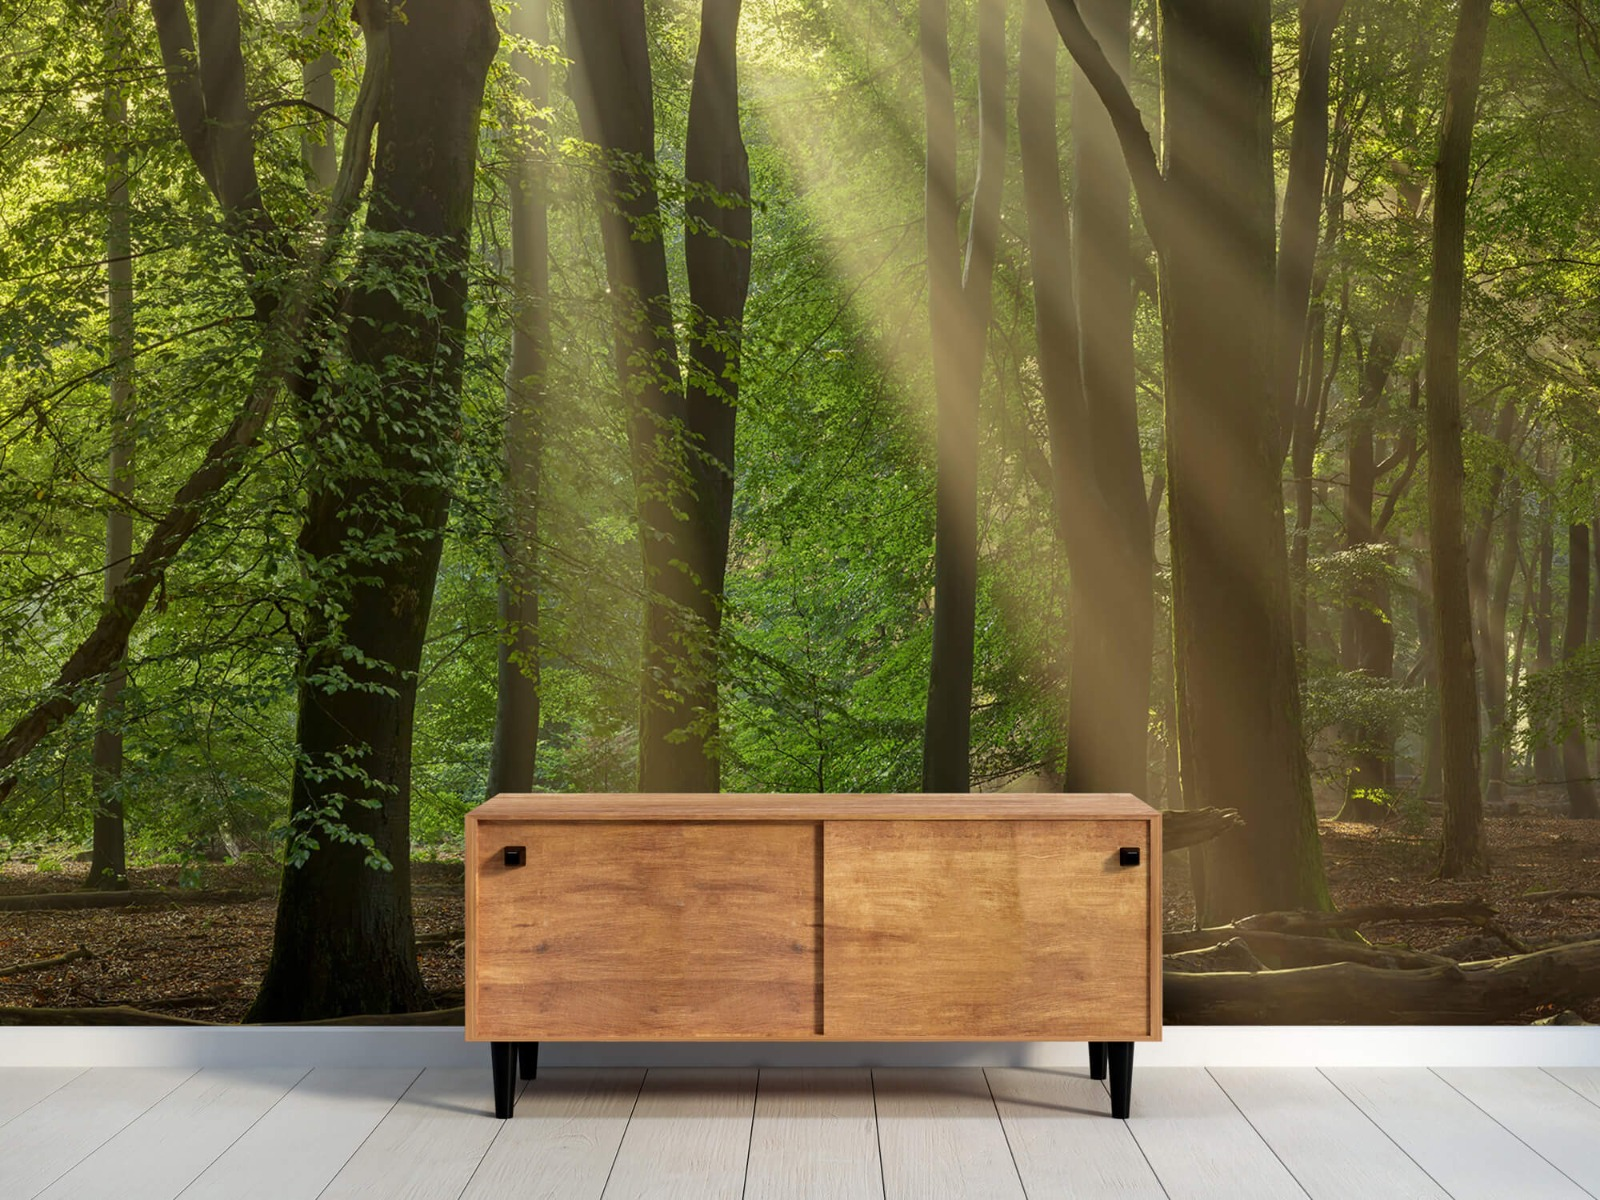 Bomen - Zonneharpen in het bos - Slaapkamer 11